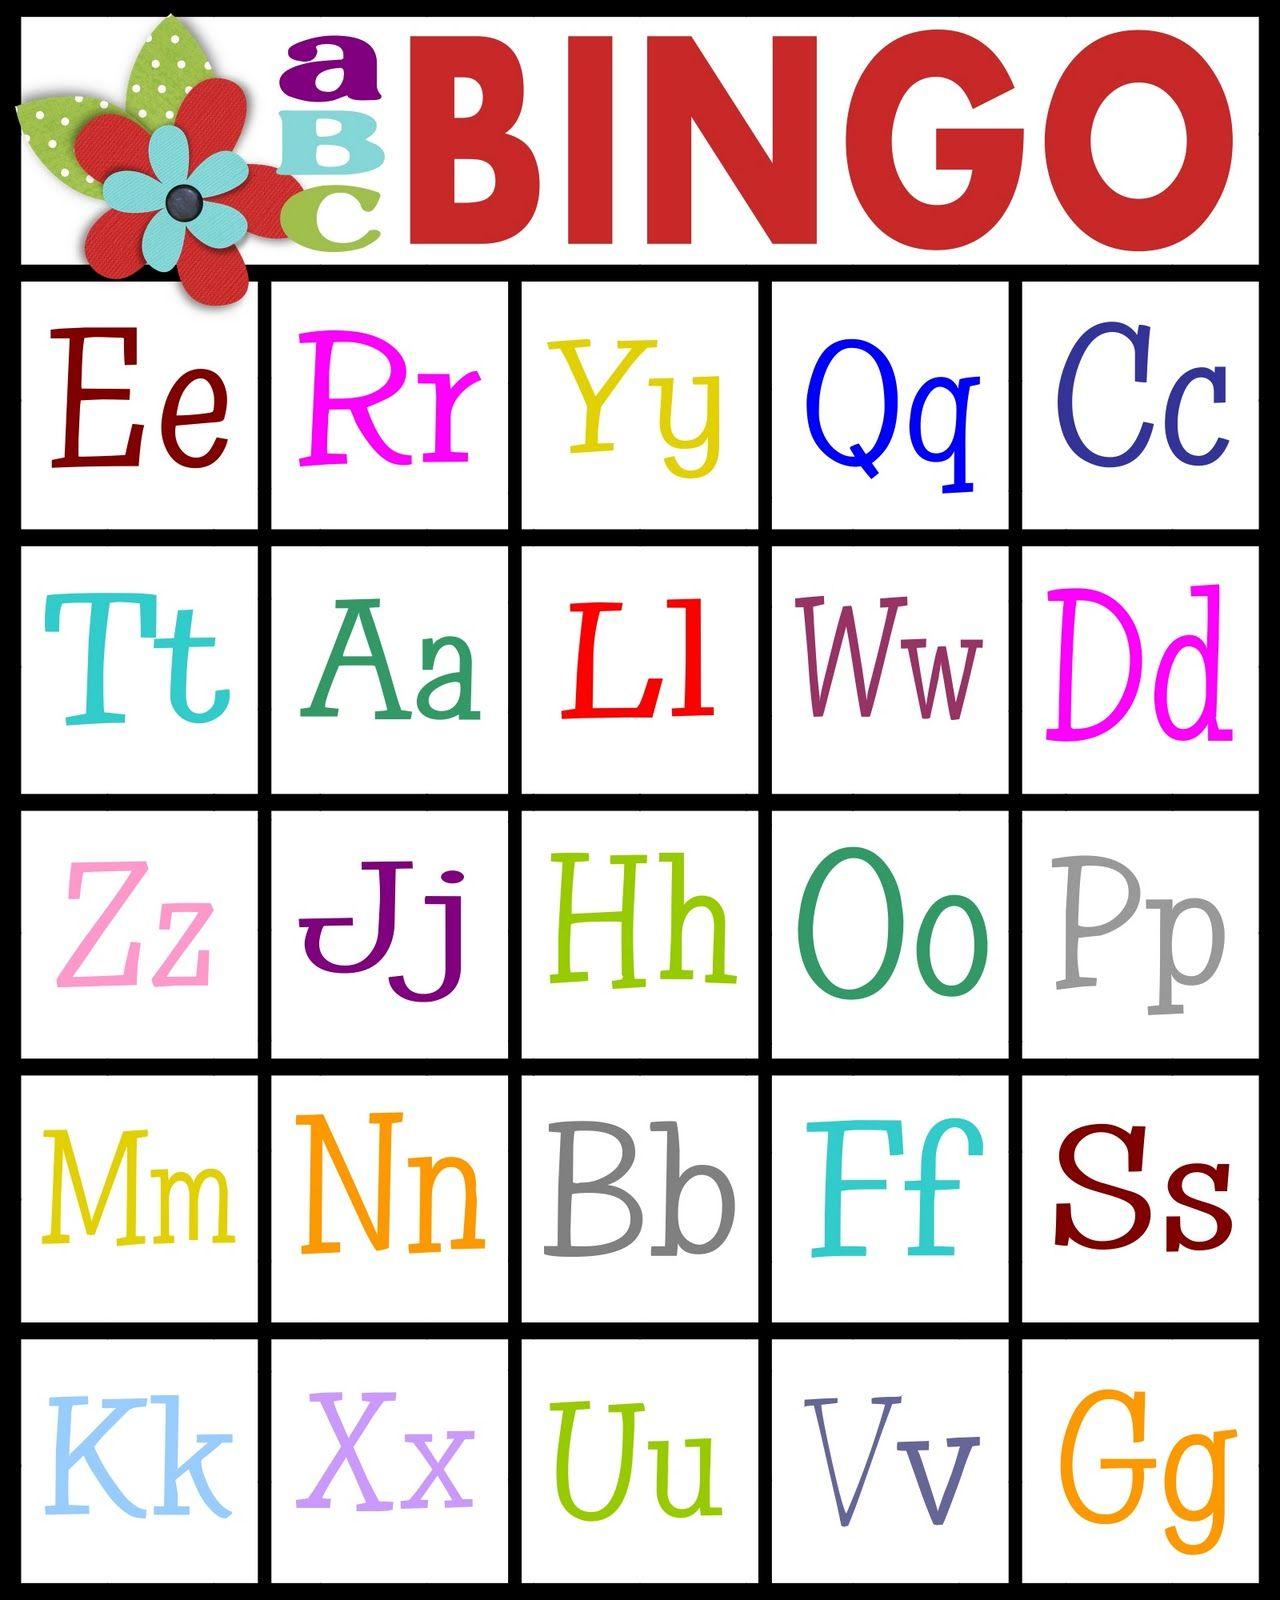 Abc's Bingo- Free Printable! | Teaching Letter Recognition